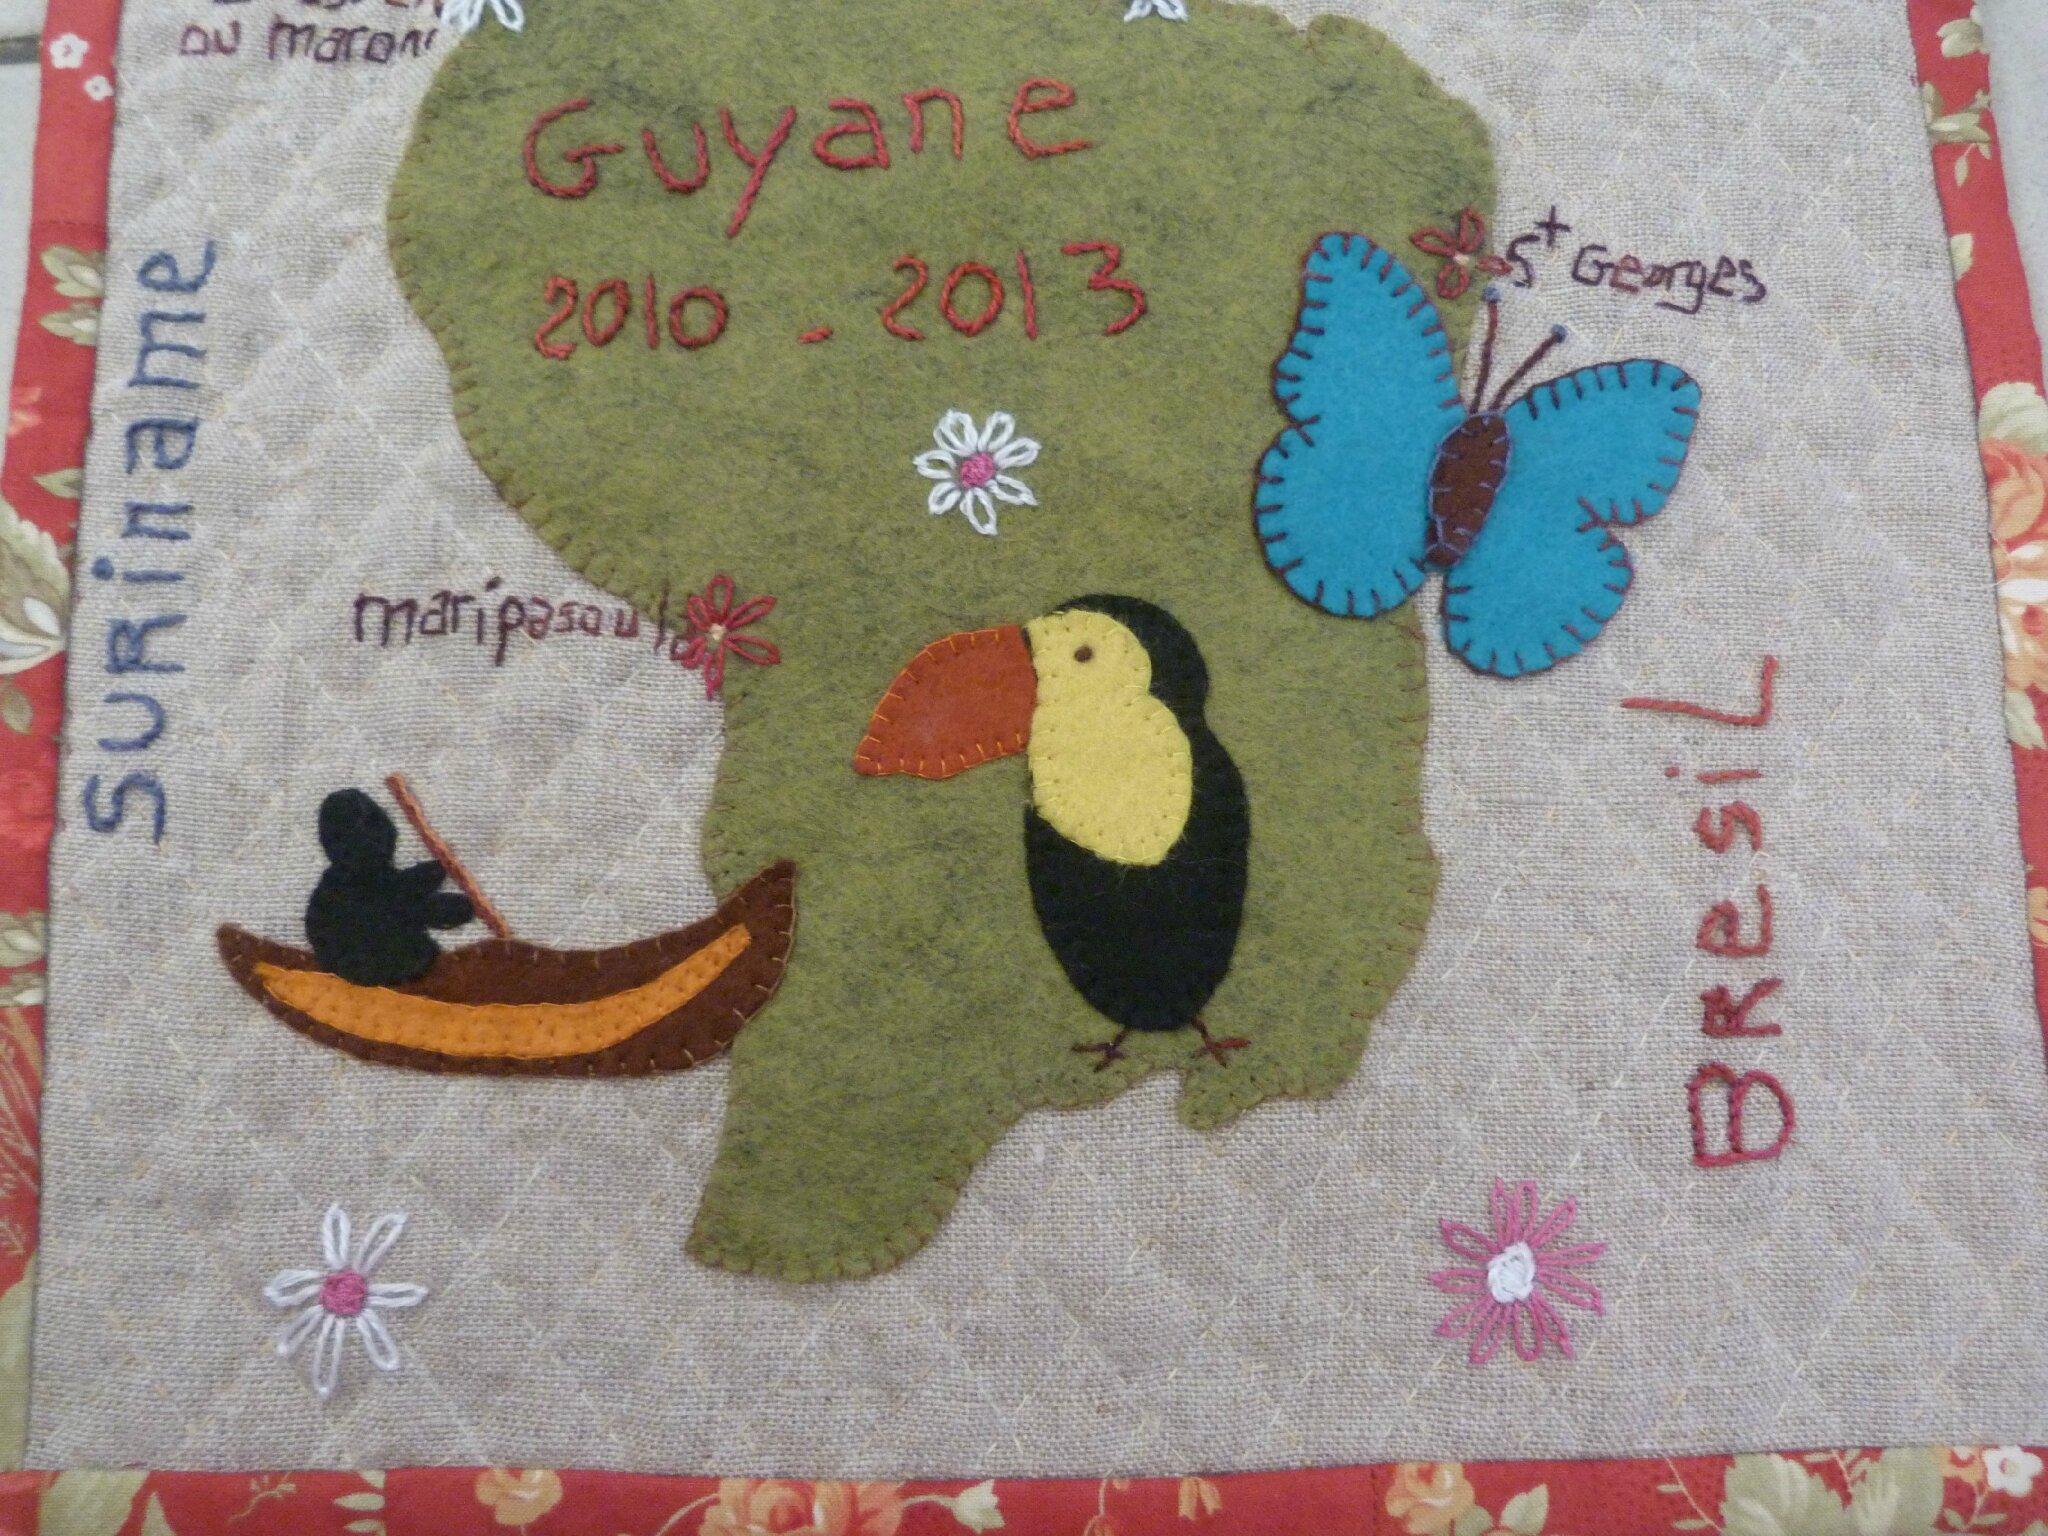 * Guyane *